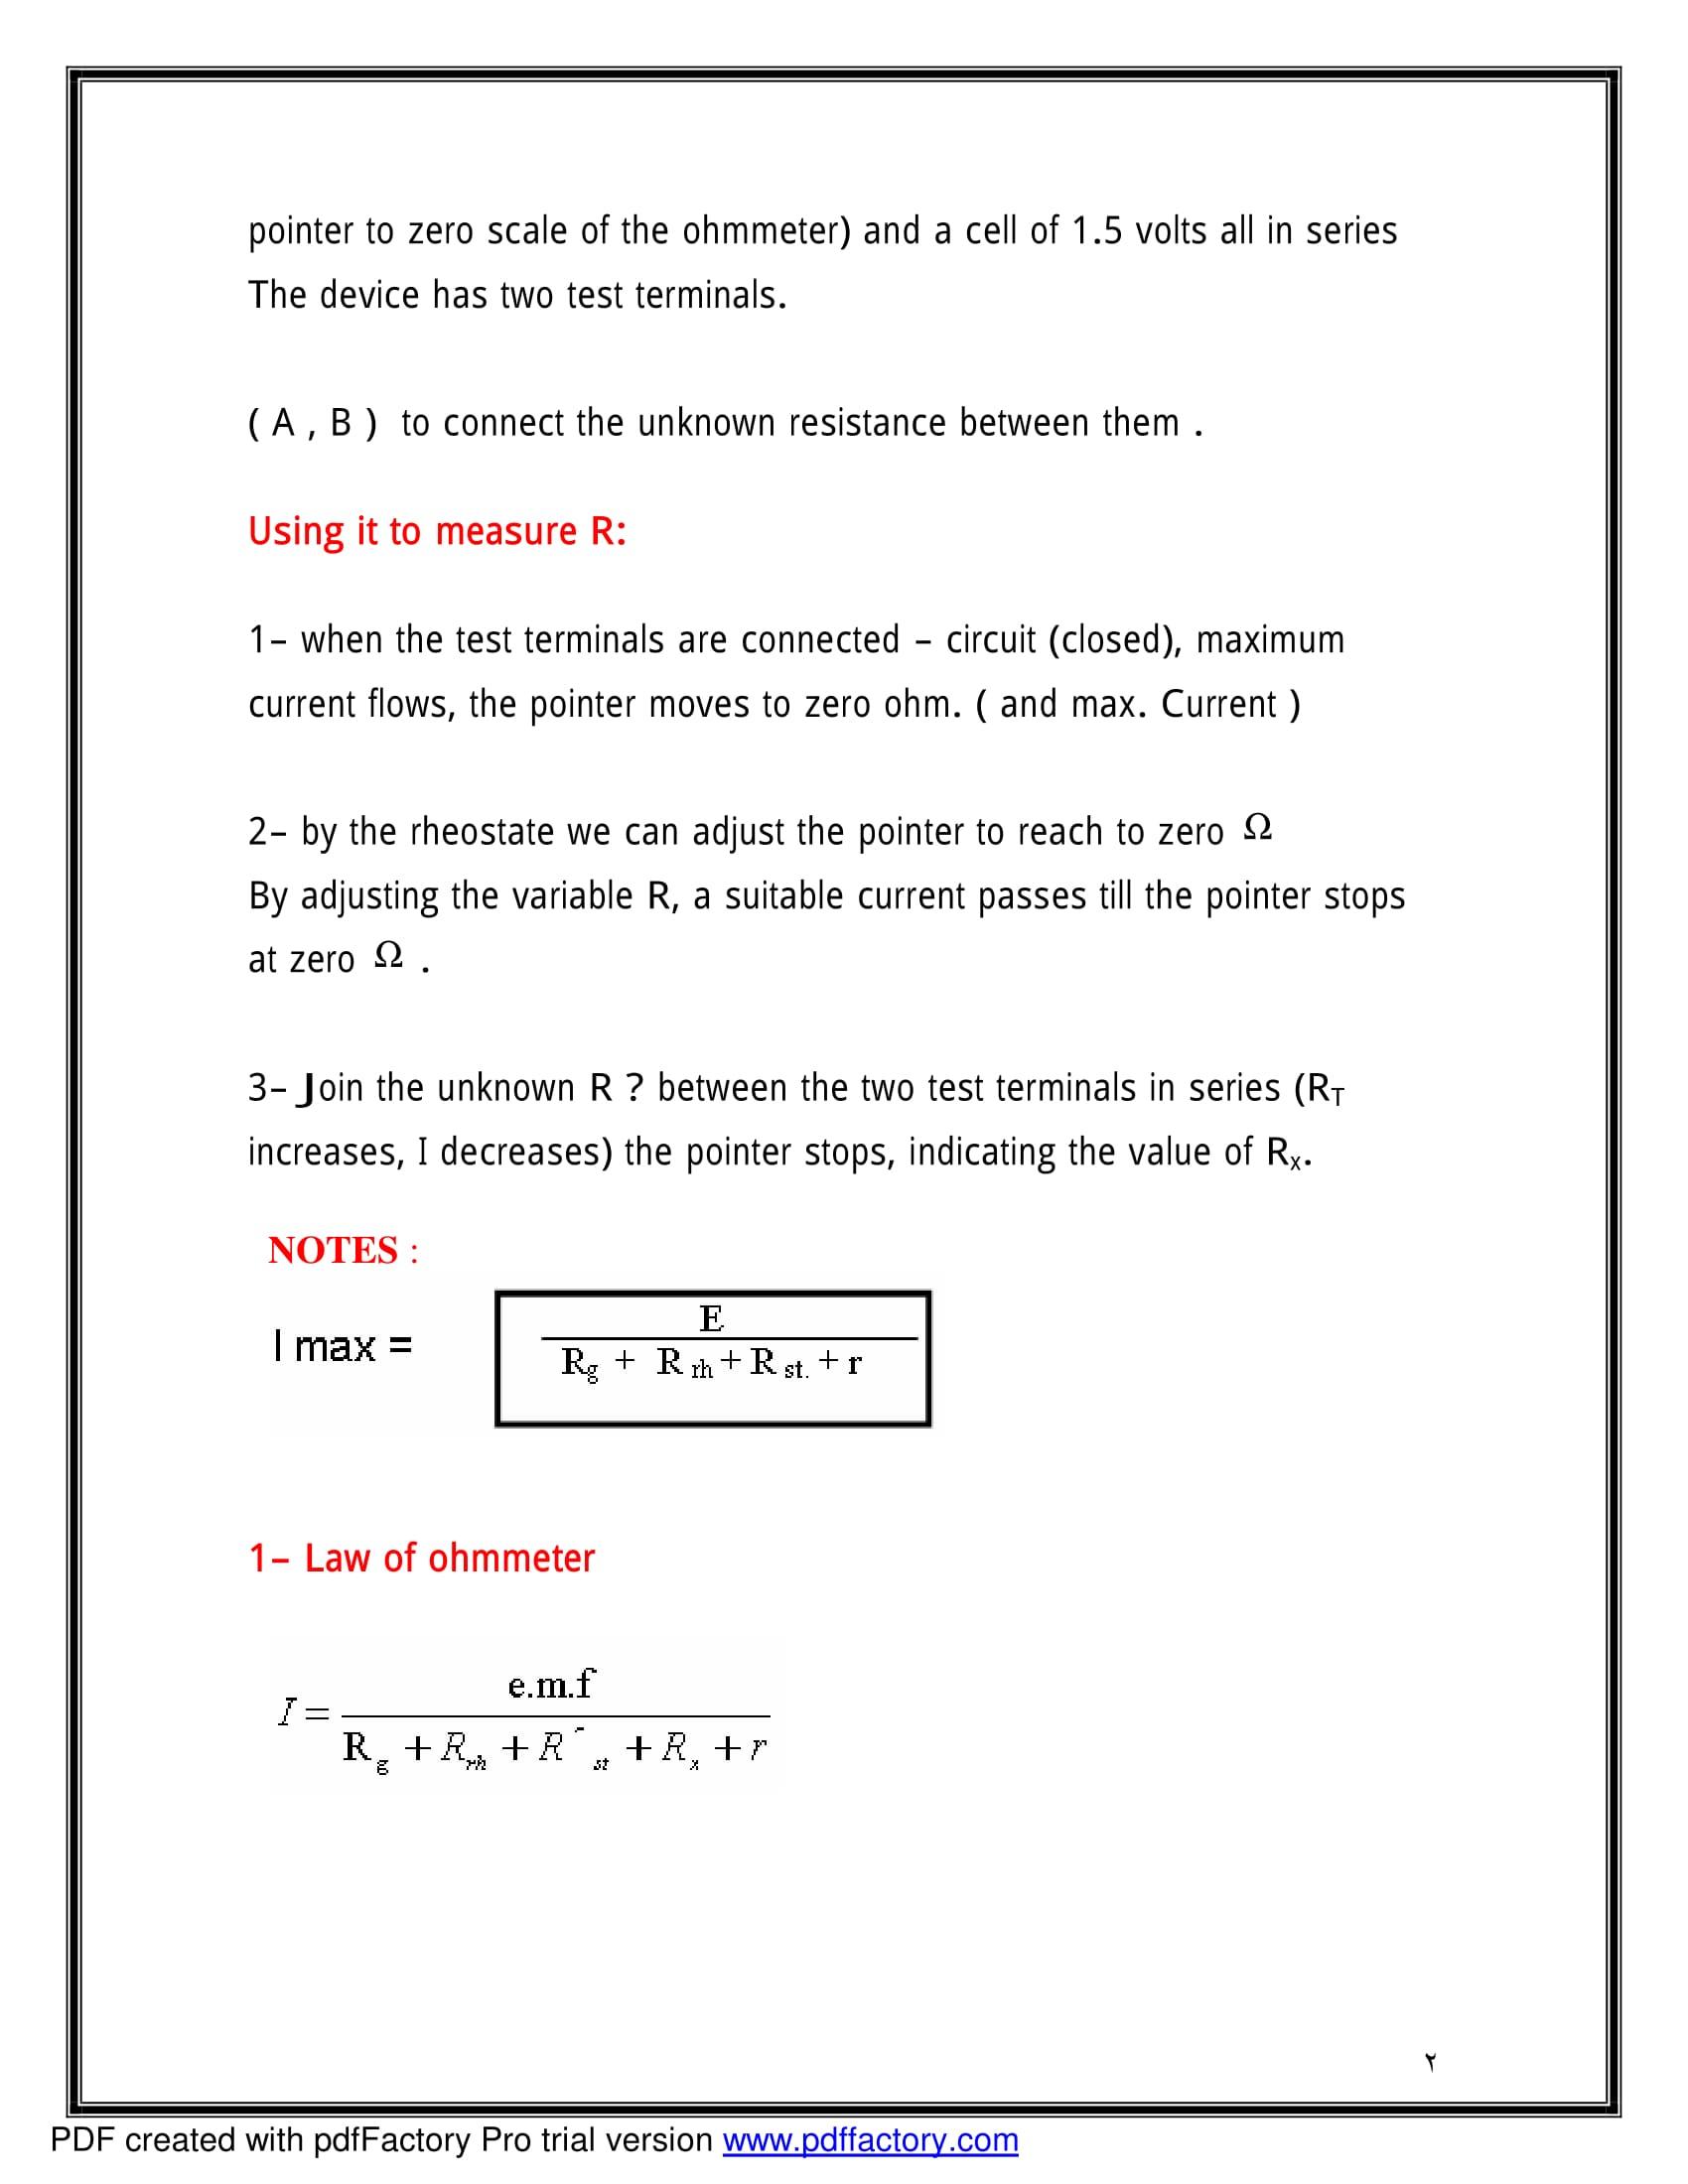 exam-eg.com_1512393334311.jpg